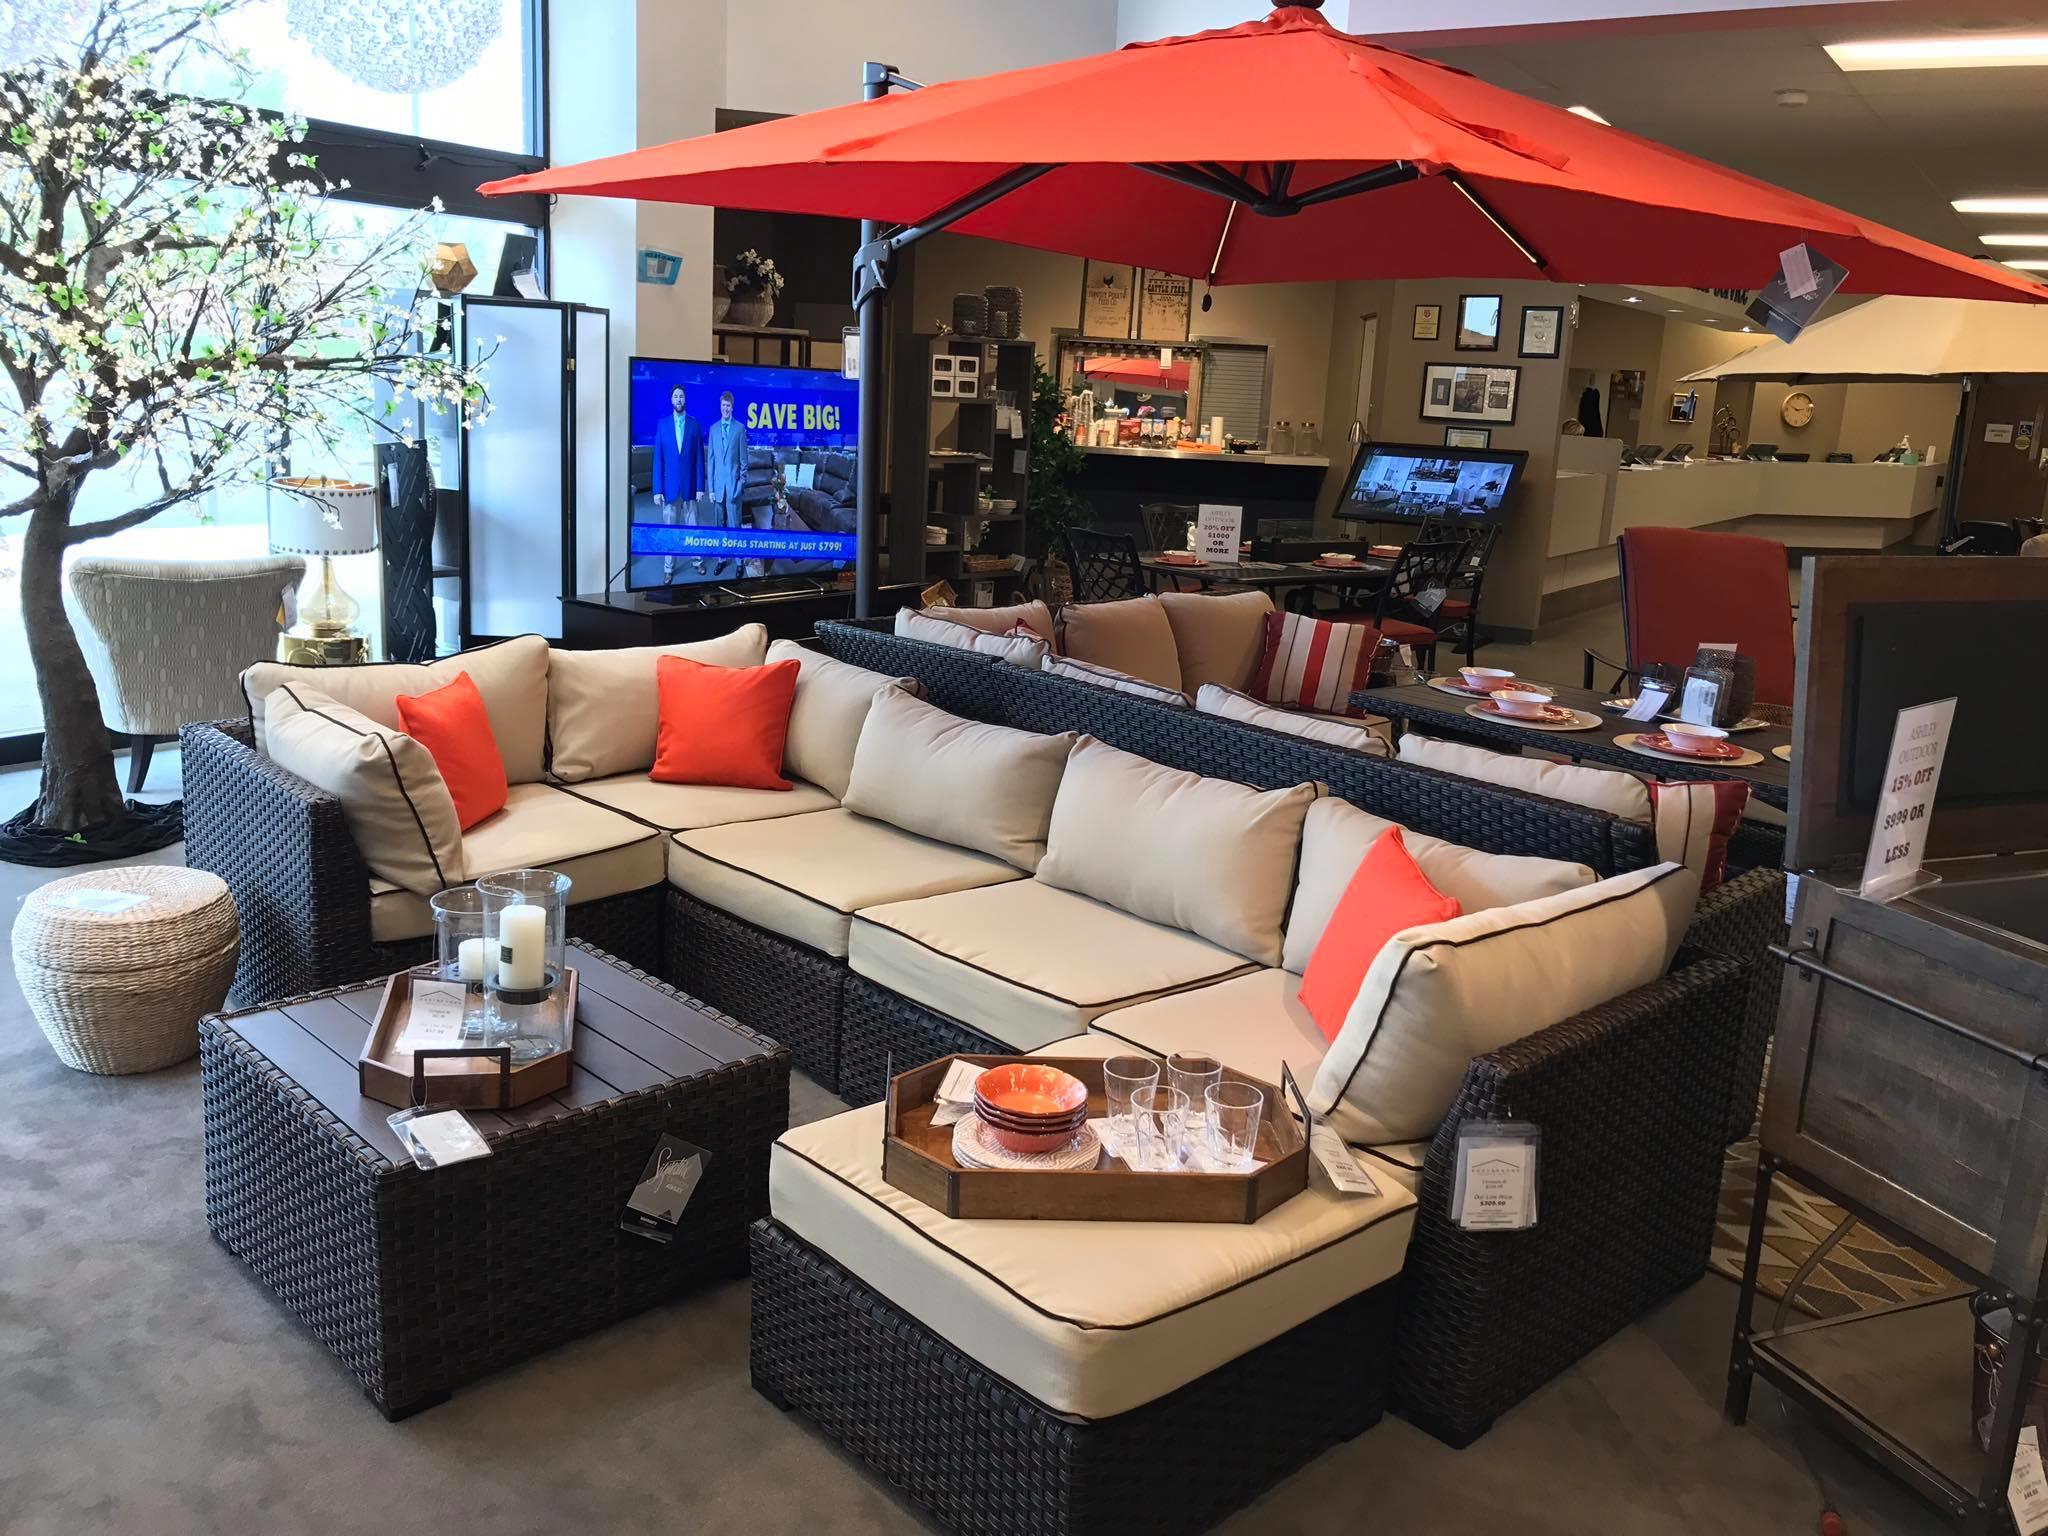 Gustafsonu0027s Furniture And Mattress 808 W Riverside Blvd Rockford, IL  Furniture Stores   MapQuest